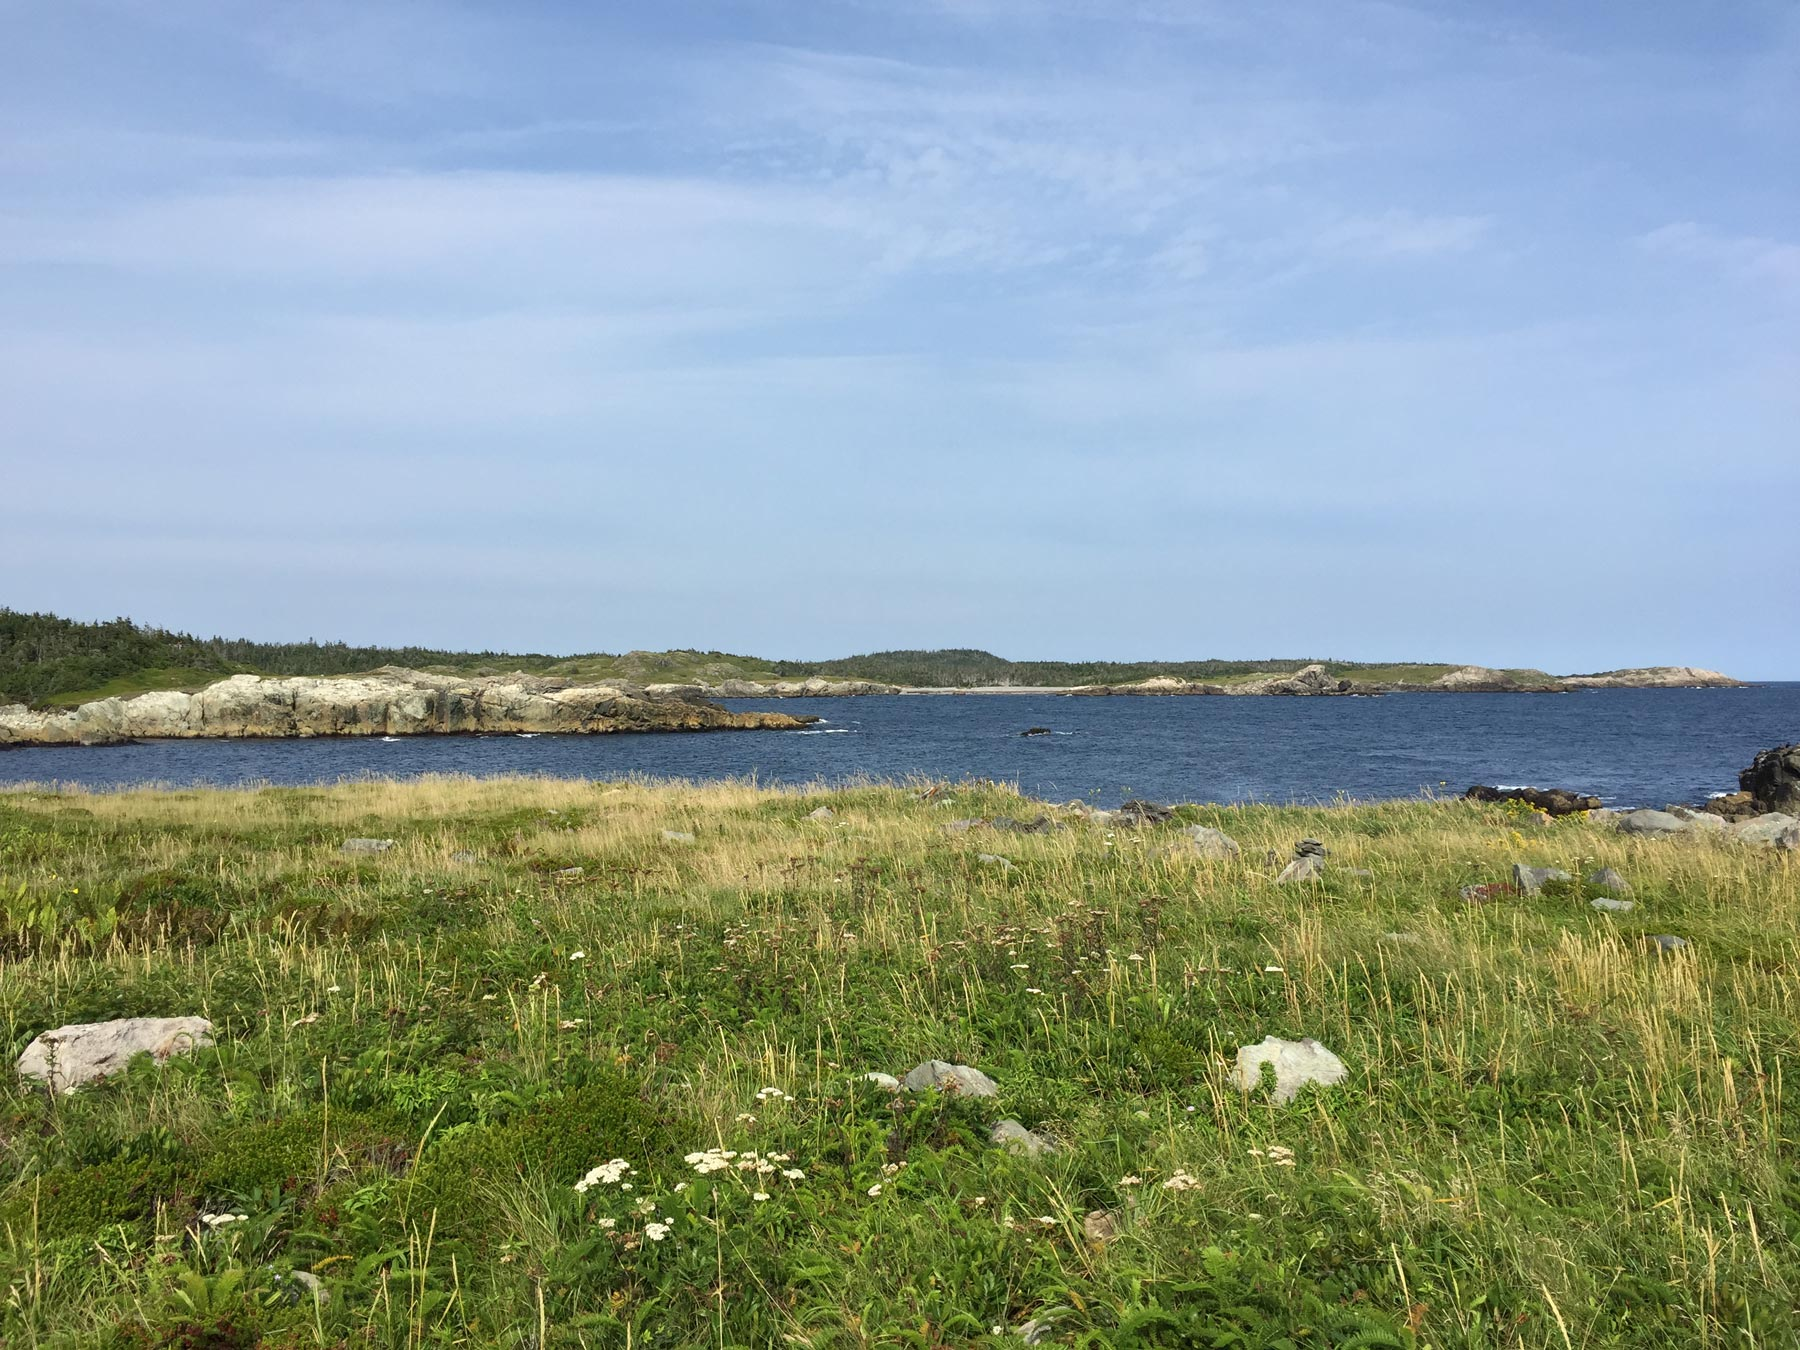 21-09-2018-Cape-Breton2.jpg